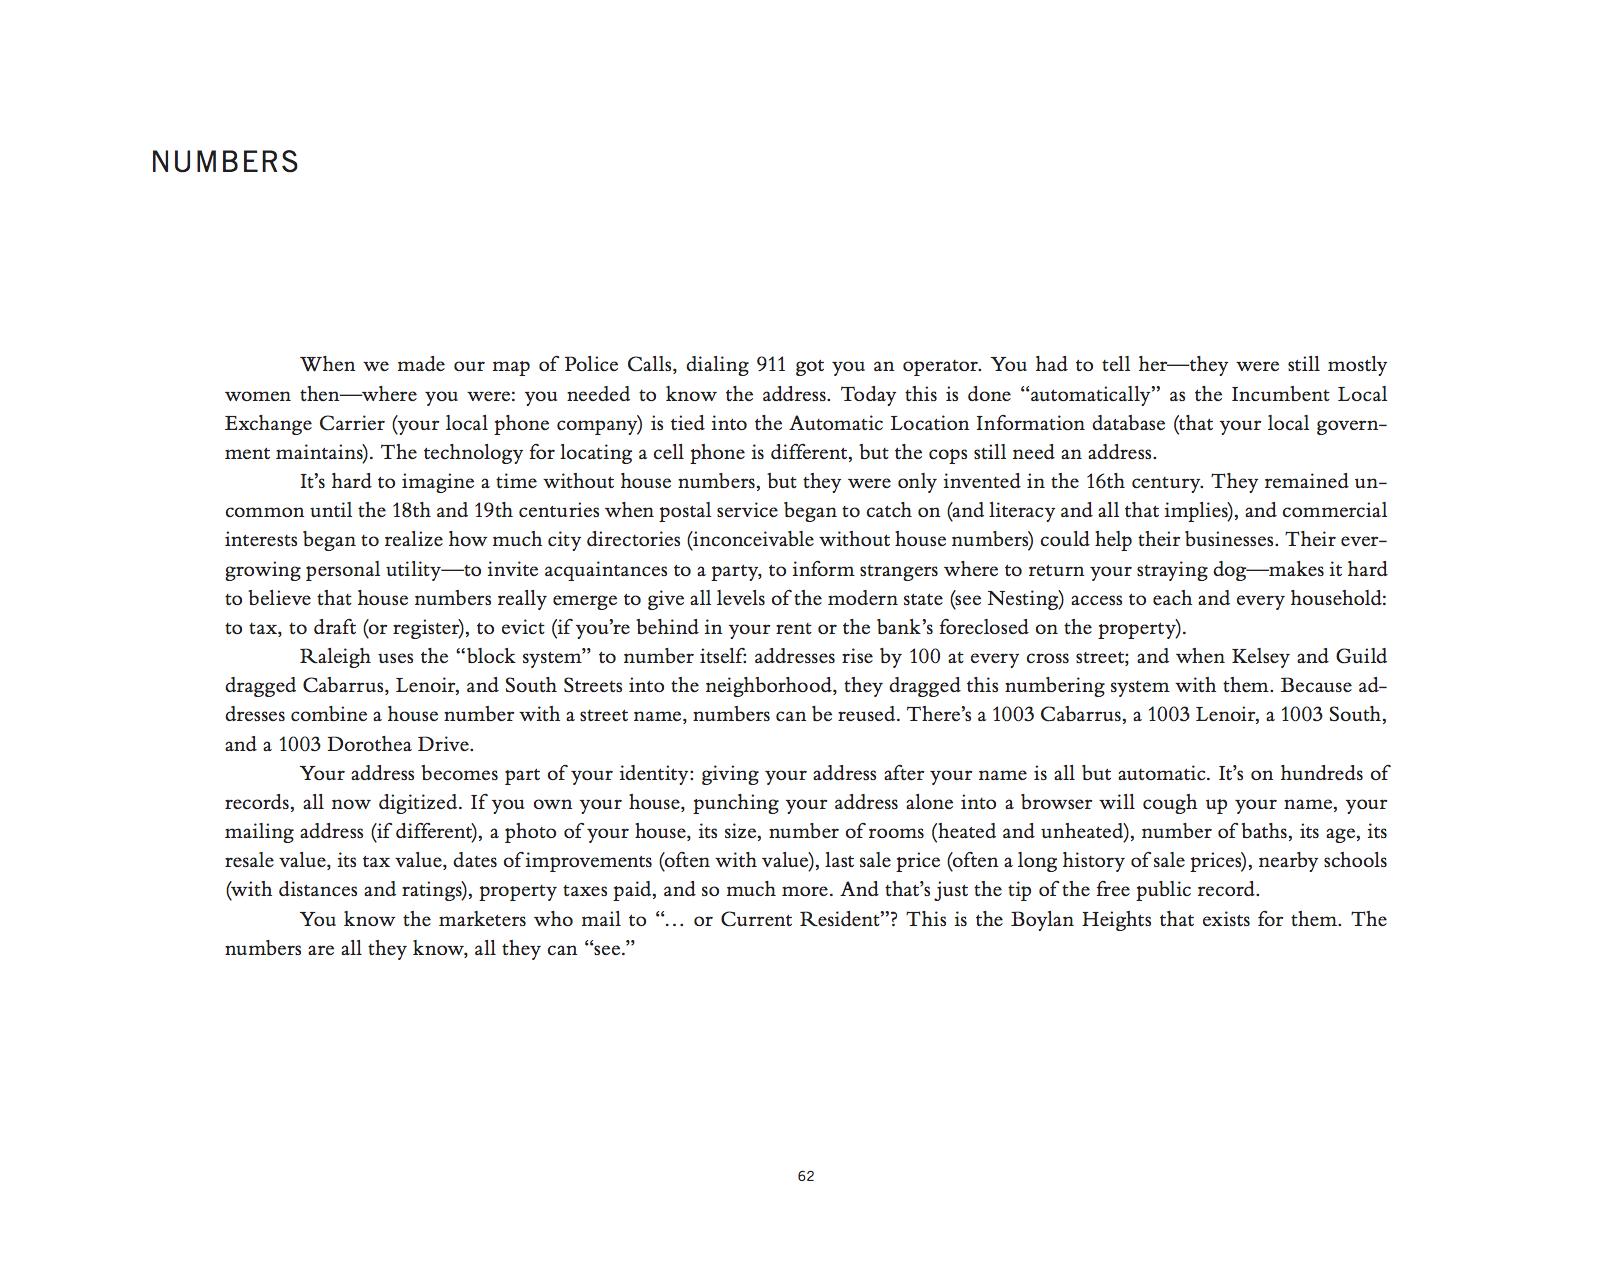 Plato biography essay